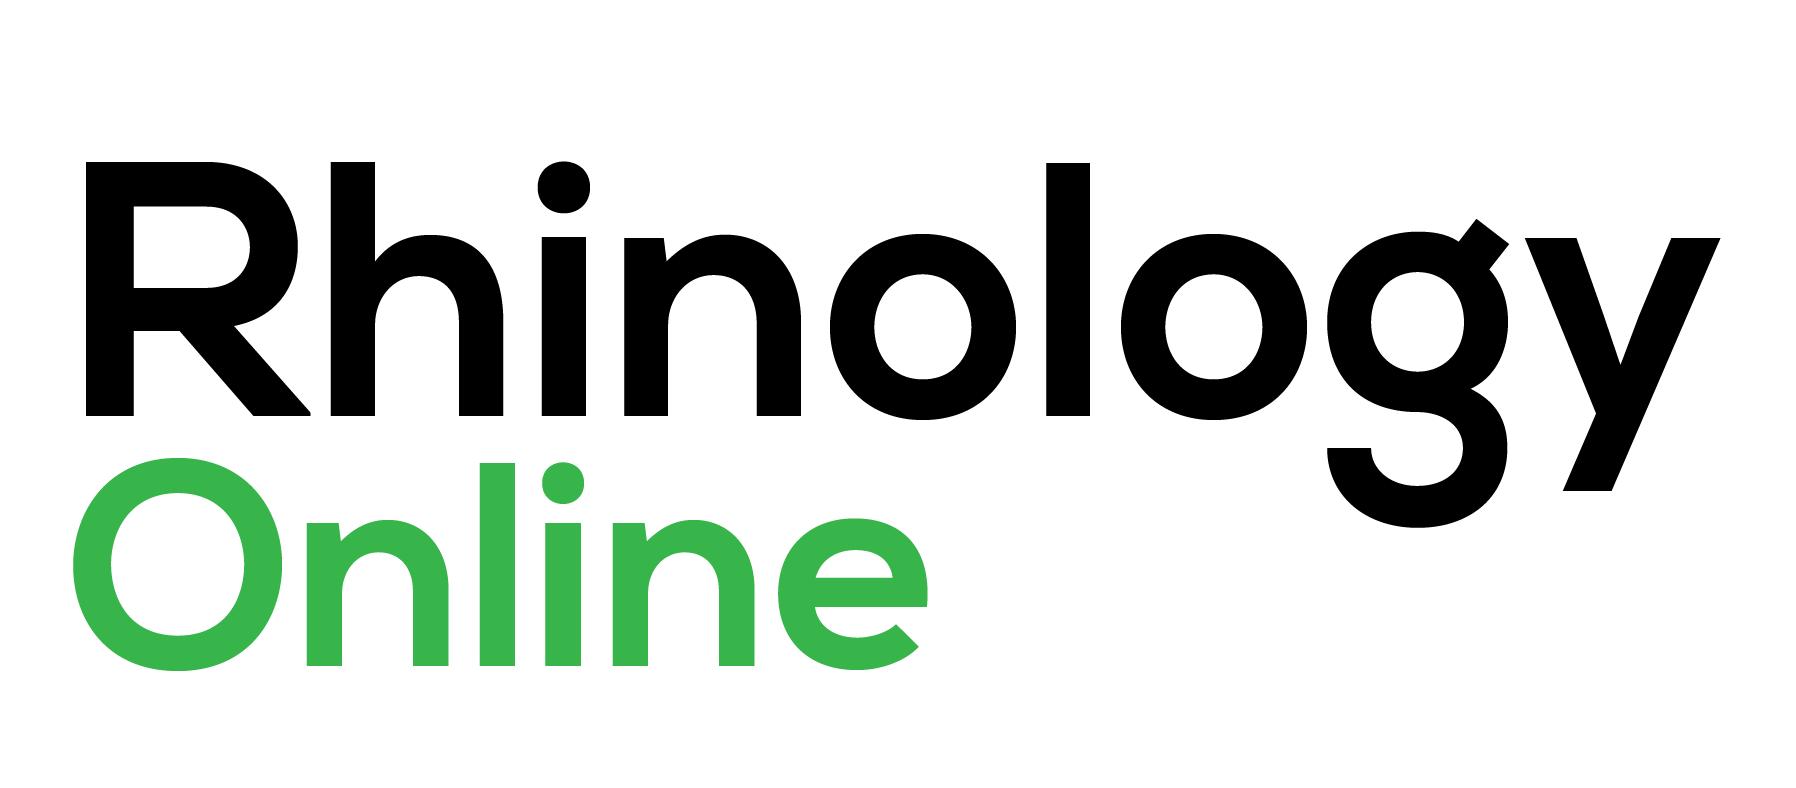 Rhinology online